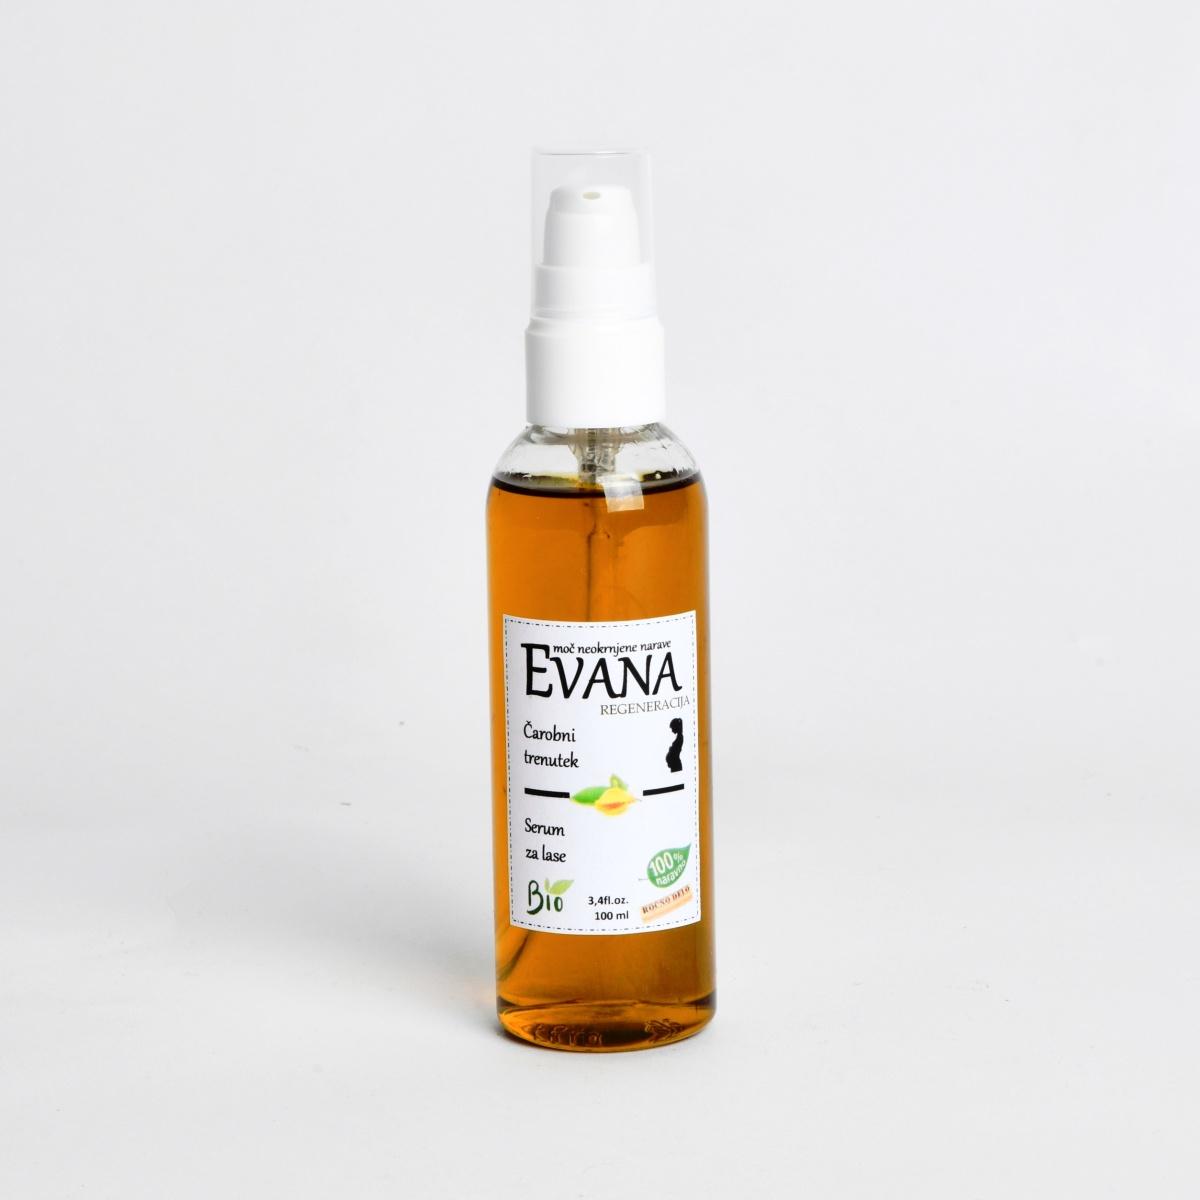 BIO serum za lase 02 05 02 100